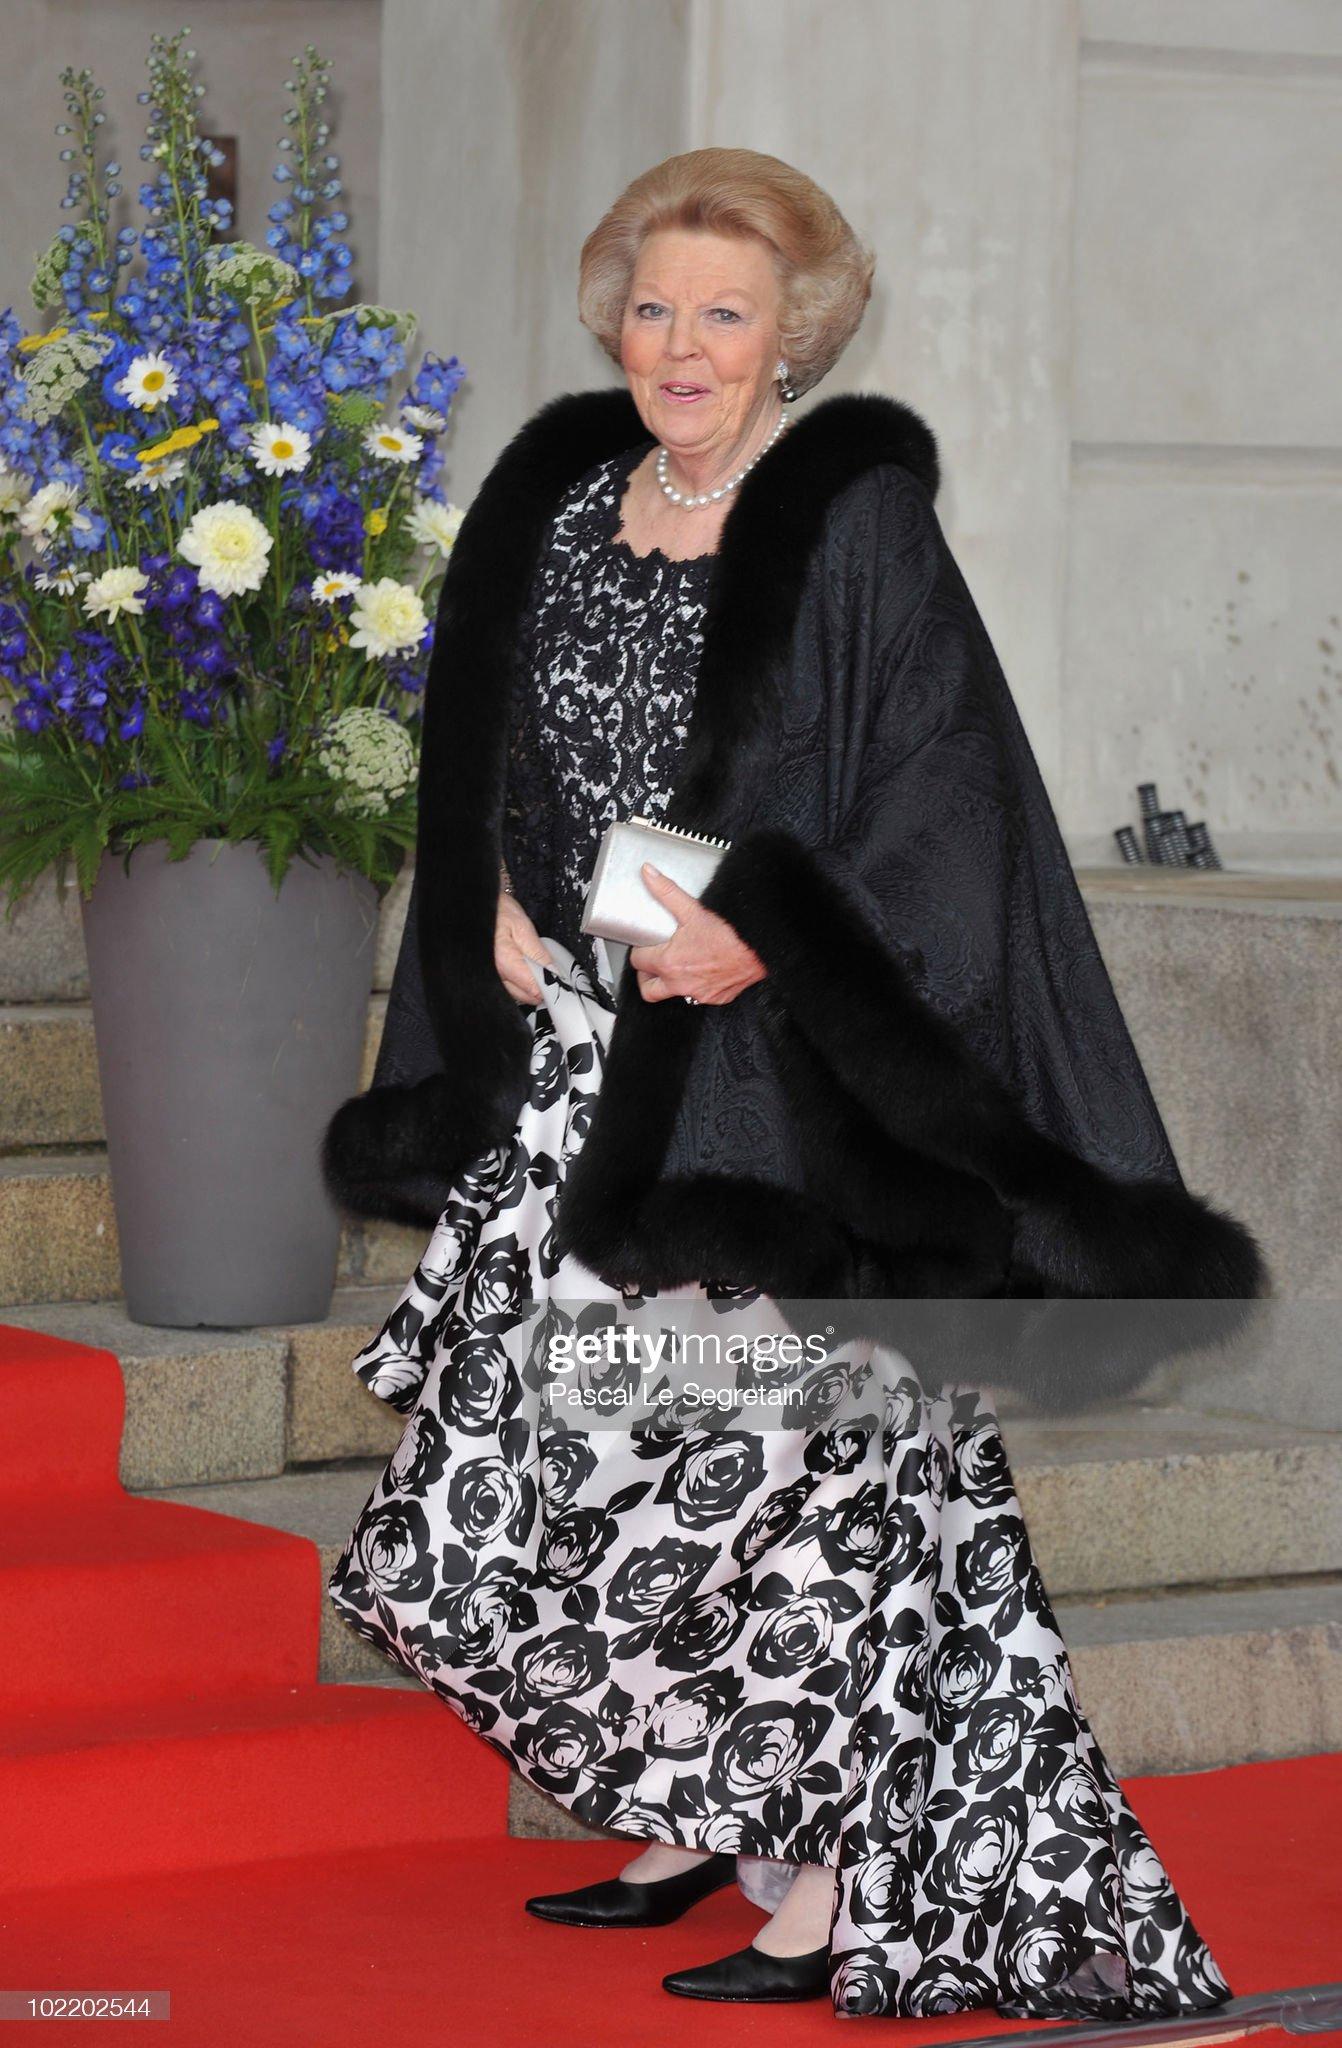 Crown Princess Victoria & Daniel Westling: Pre Wedding Dinner - Arrivals : News Photo